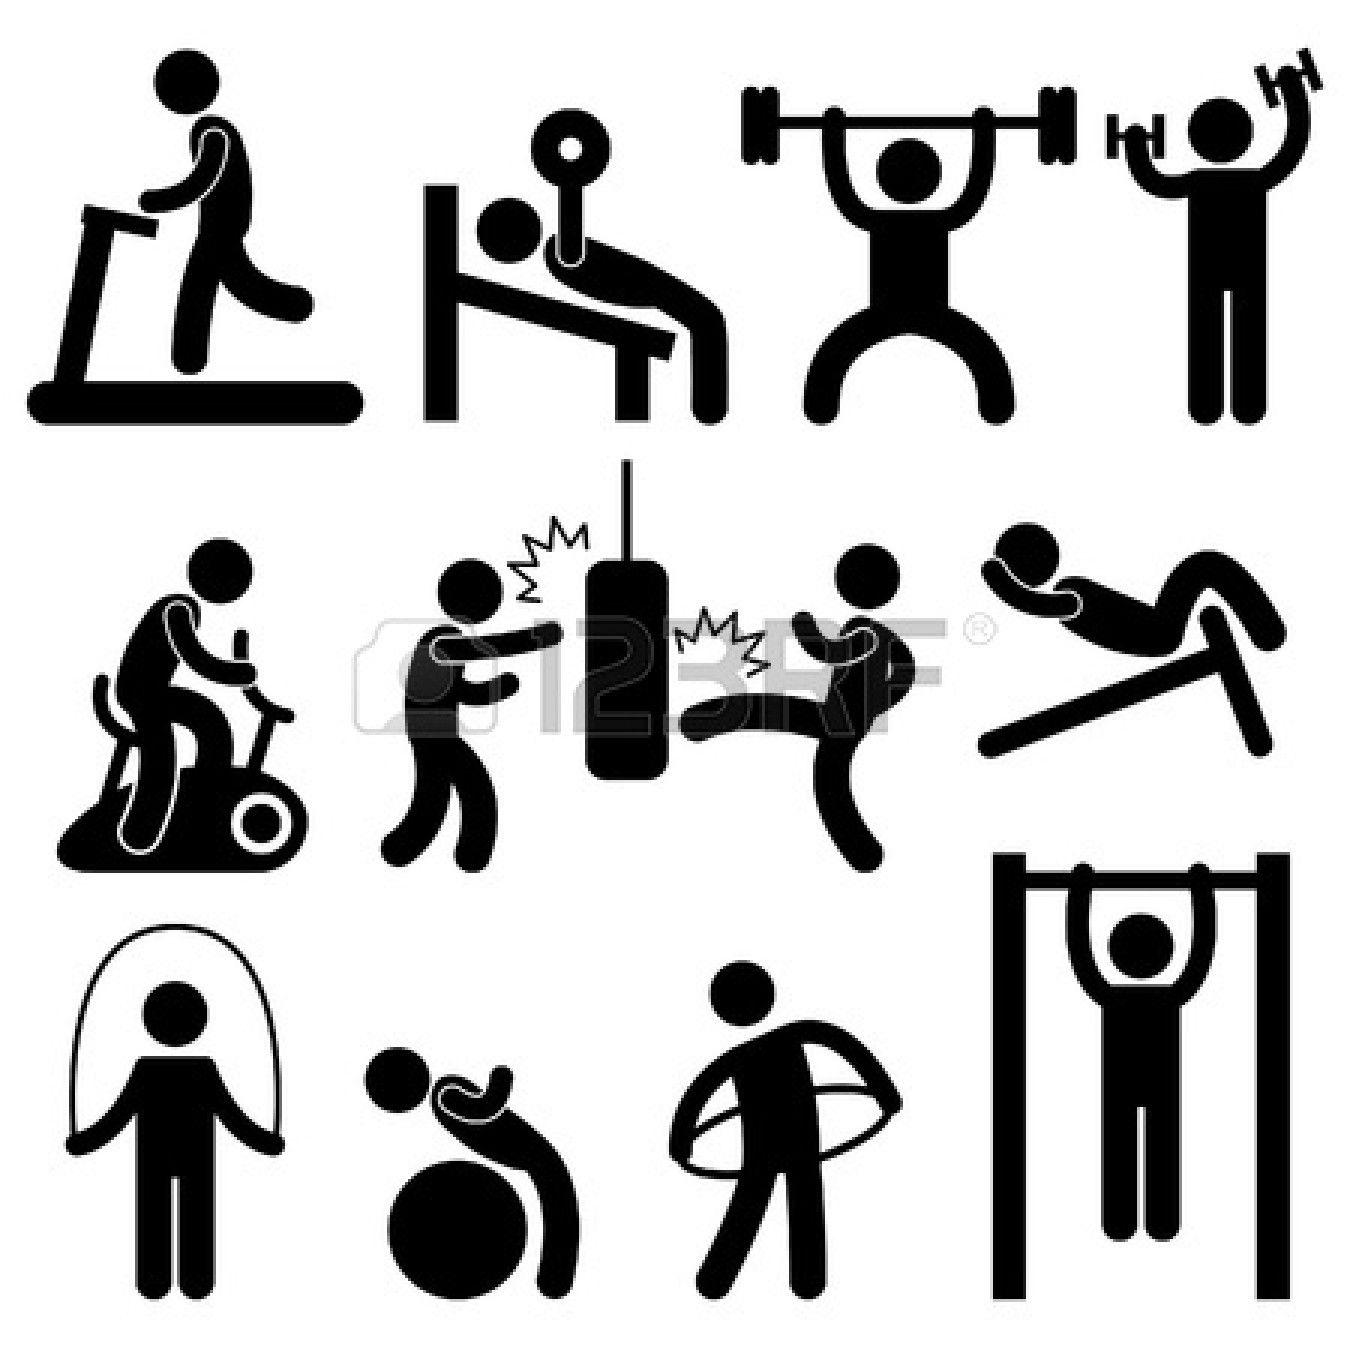 Stock Photo Pictogram, Bodybuilding workouts, Fitness icon